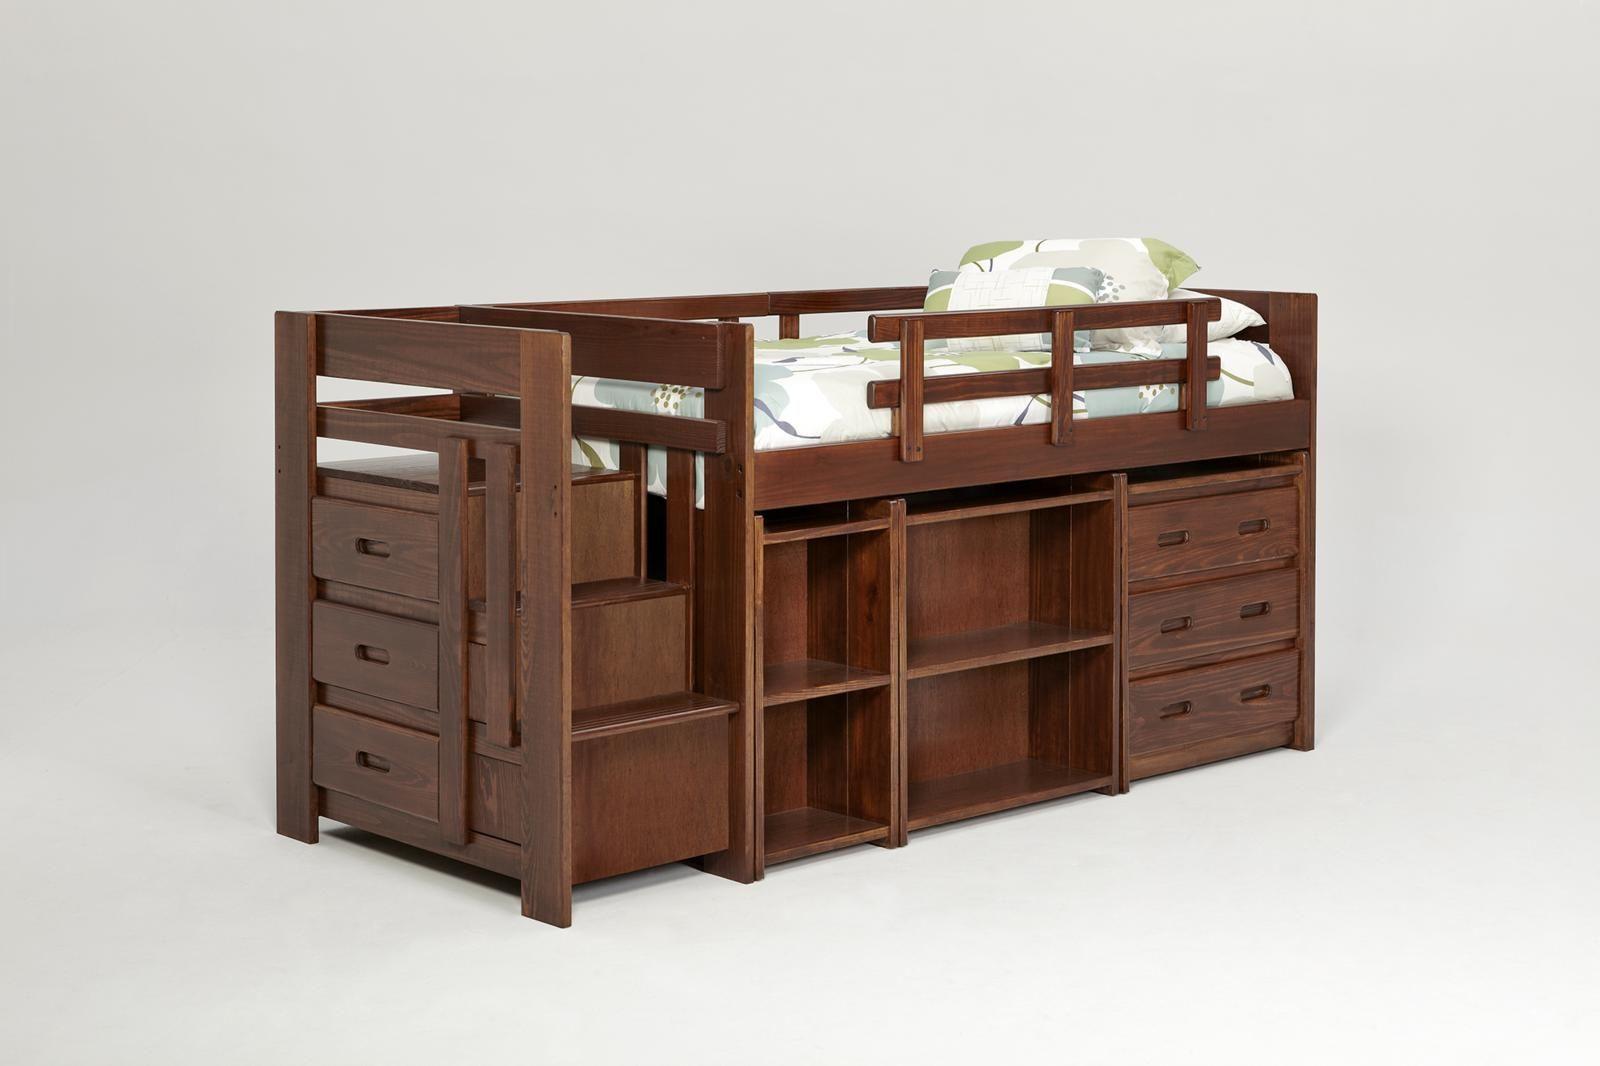 Twin loft bed ideas  Twin Mini Loft Bed with Storage Design Ideas  Twin Bed  Pinterest